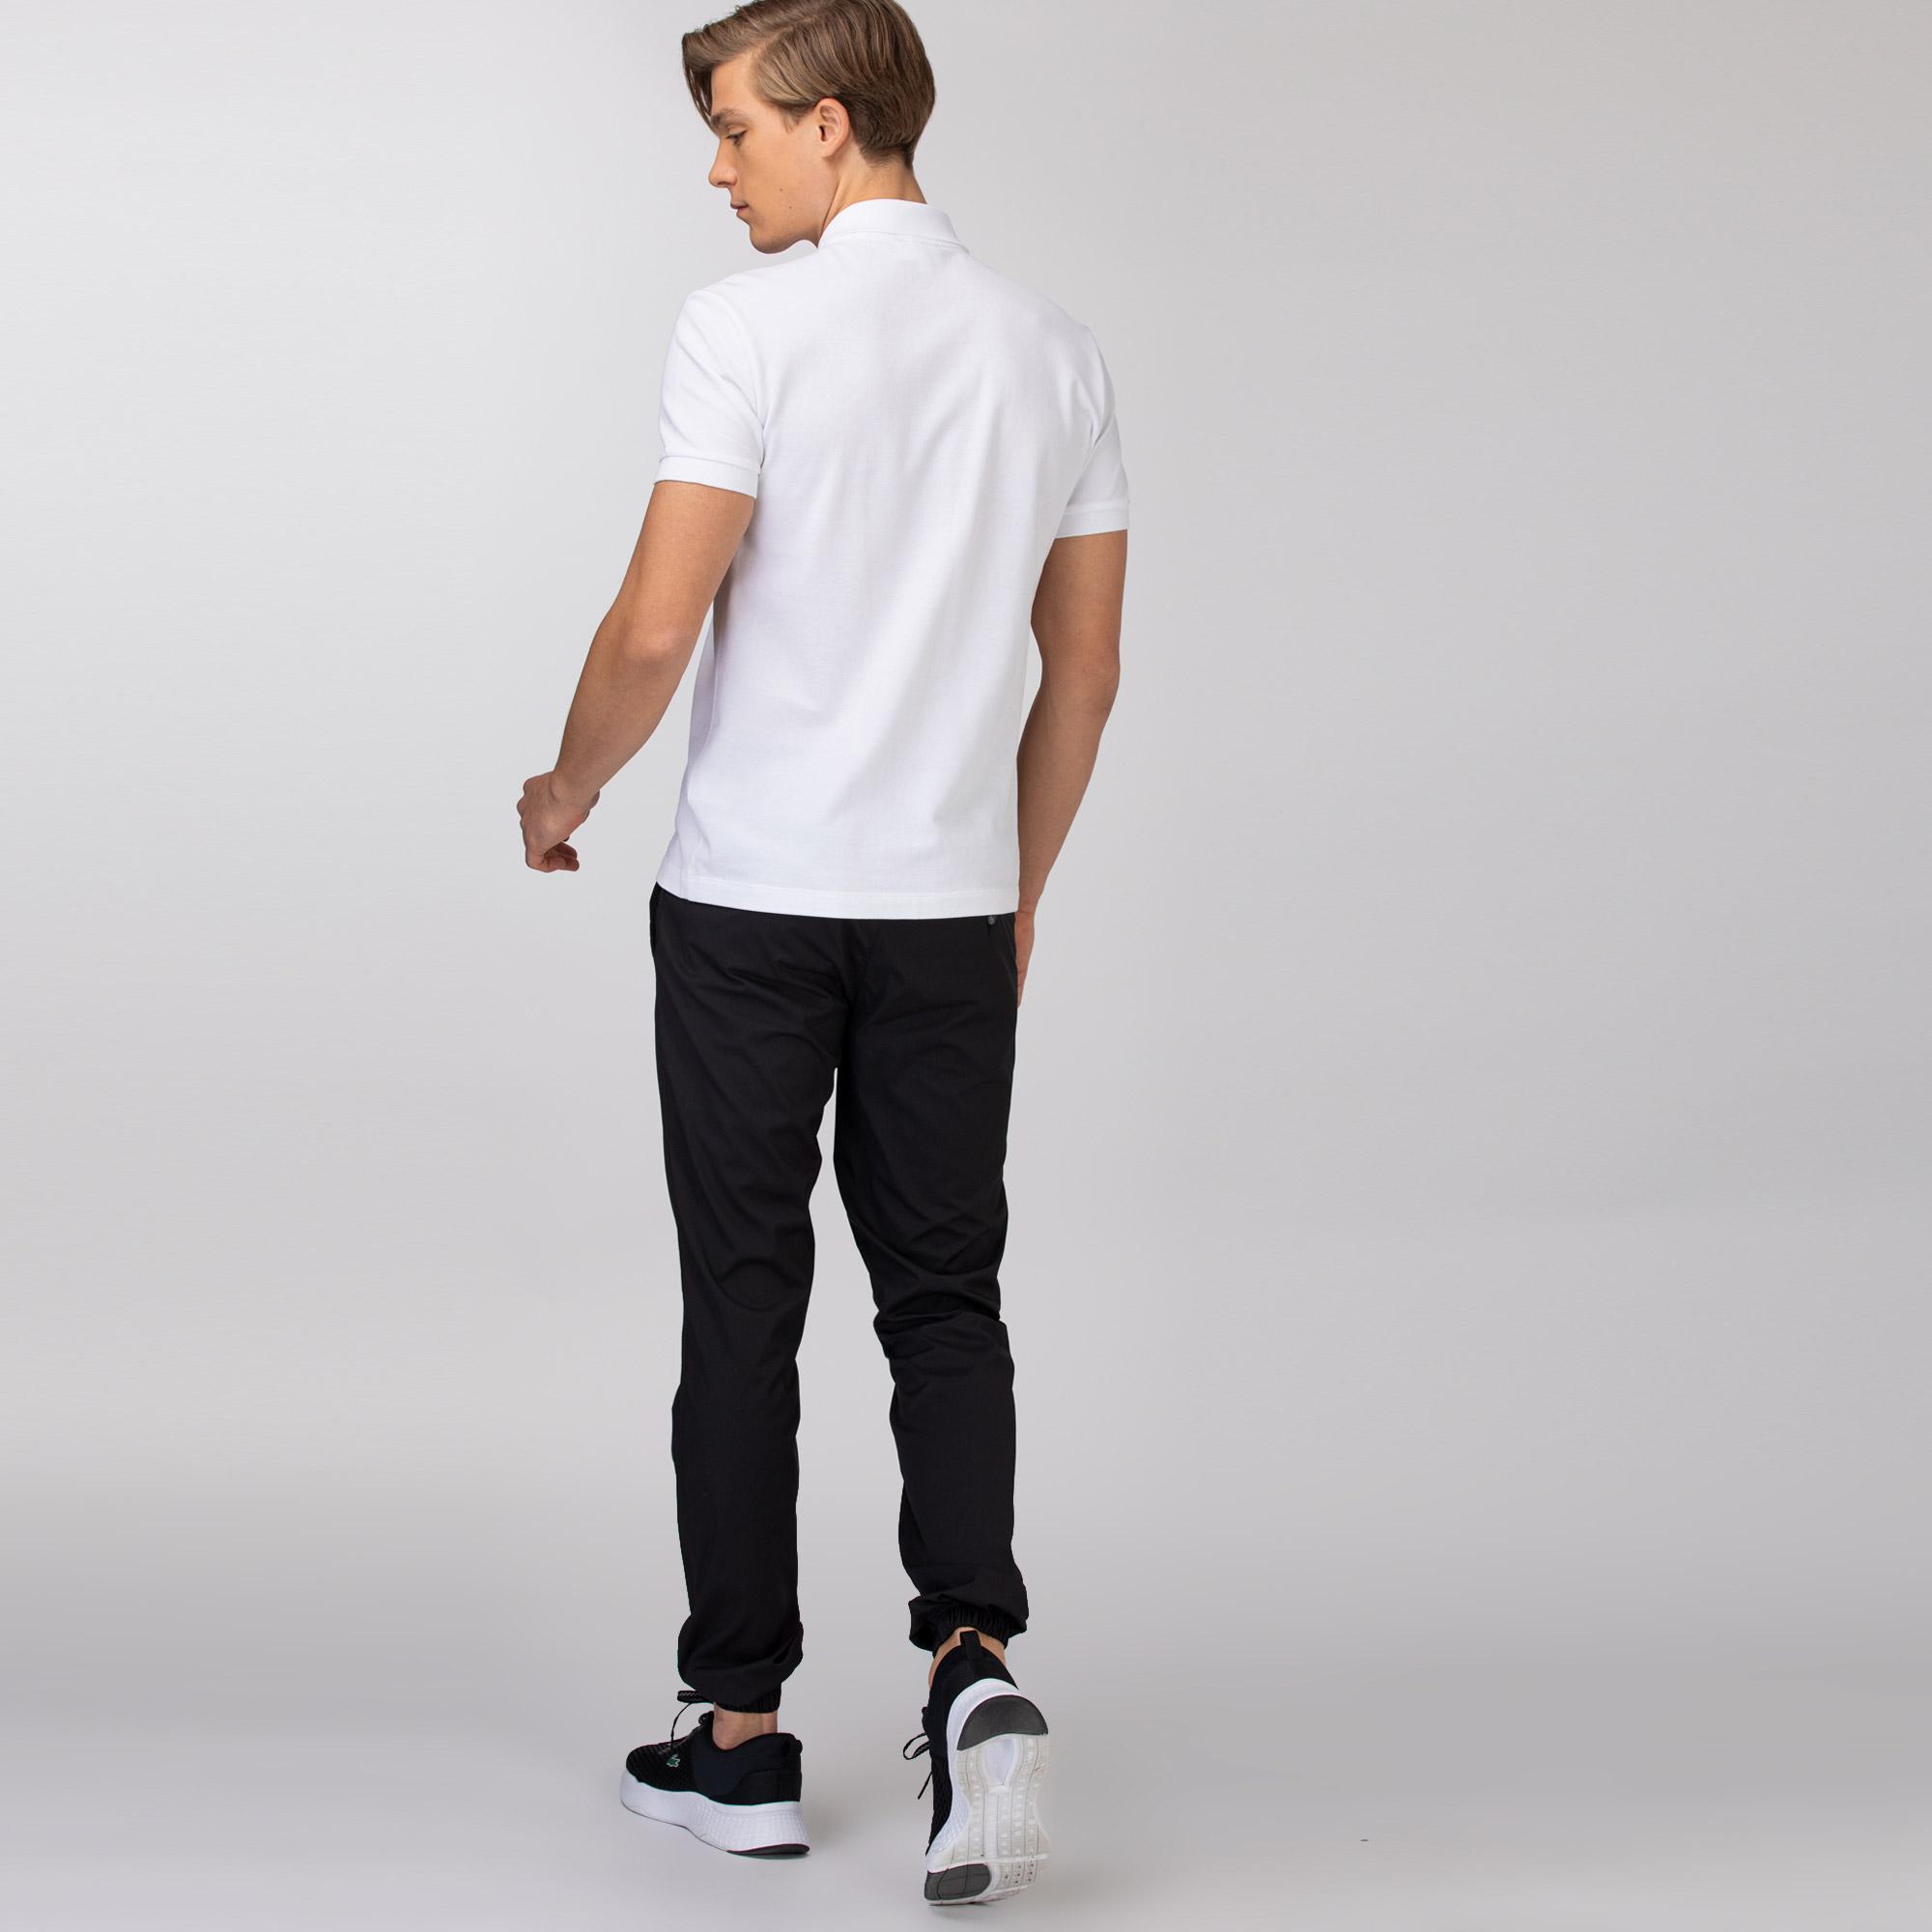 Lacoste Erkek Siyah Jogger Pantolon